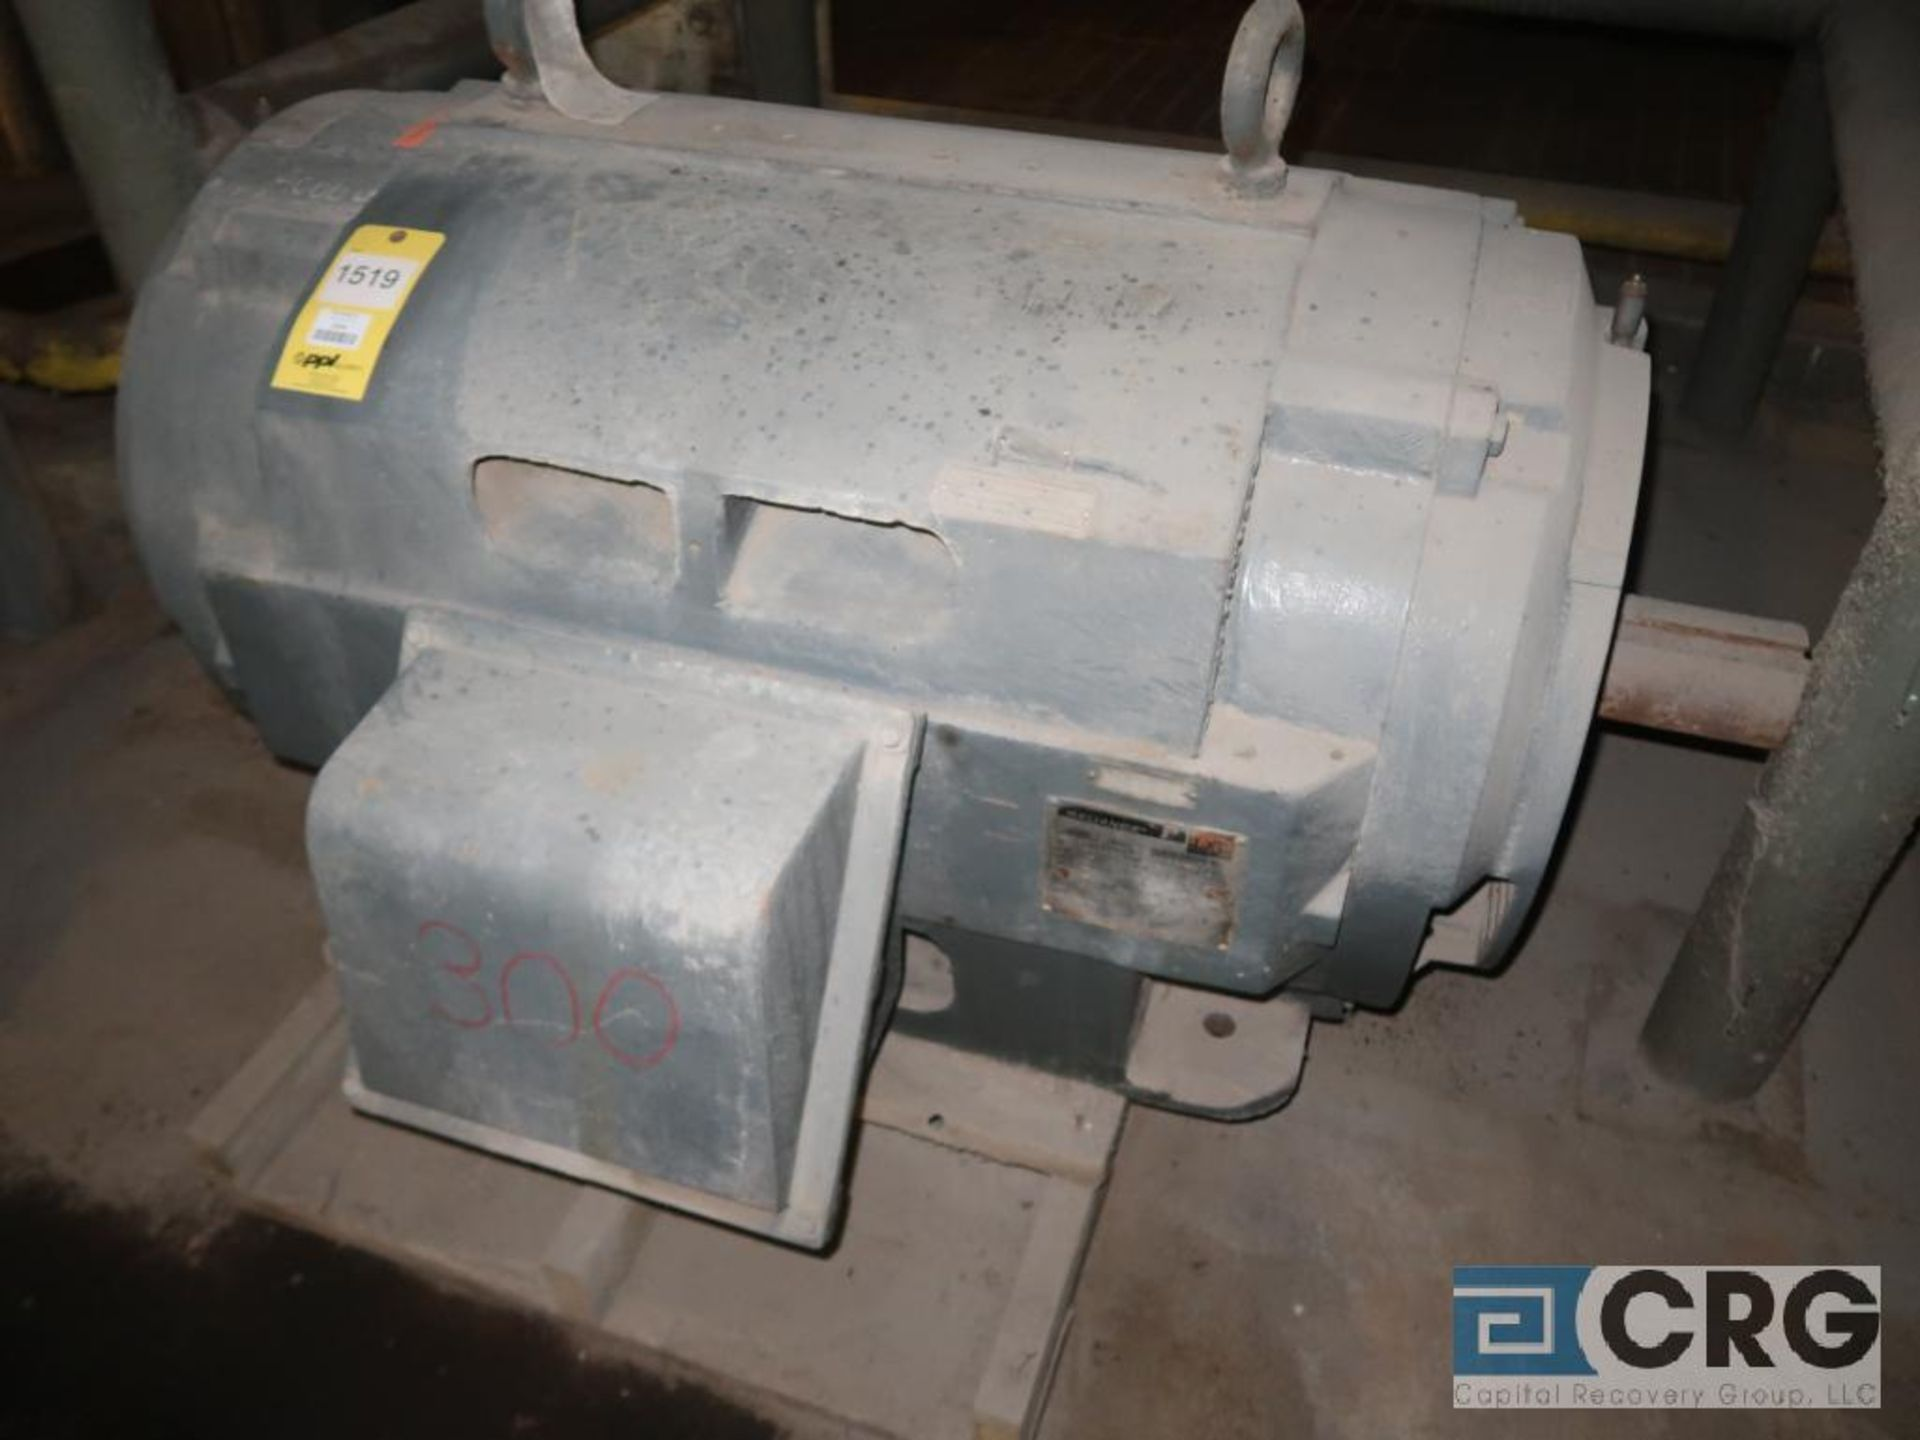 Reliance motor, 300 HP, 892 RPM, 2,300 volt, frame 255010Z, equipment #E00428 (496 Dock Area)